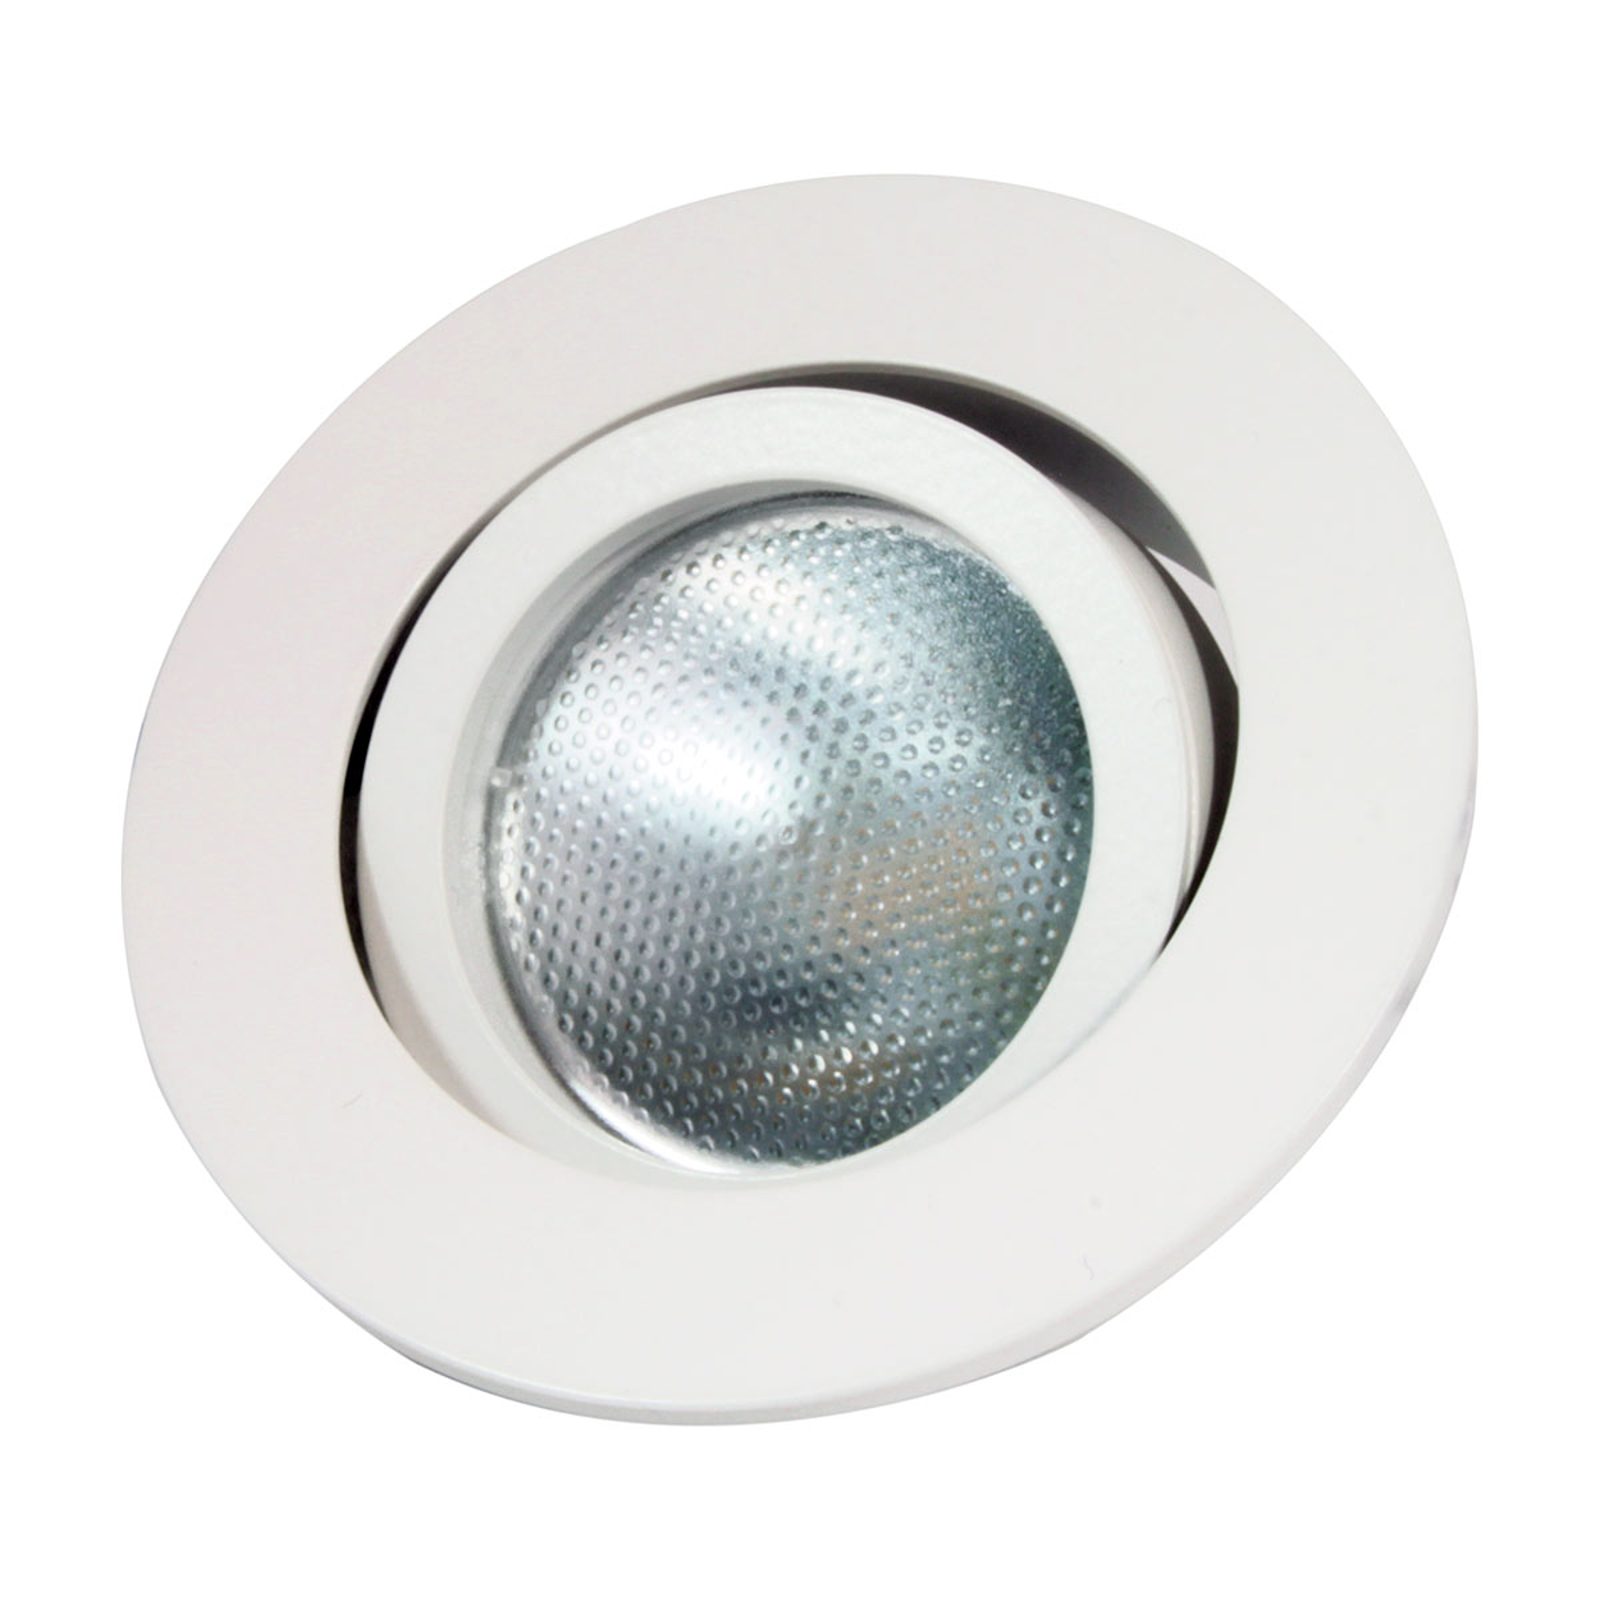 LED-Einbauring Decoclic GU10/GU5.3, rund, weiß